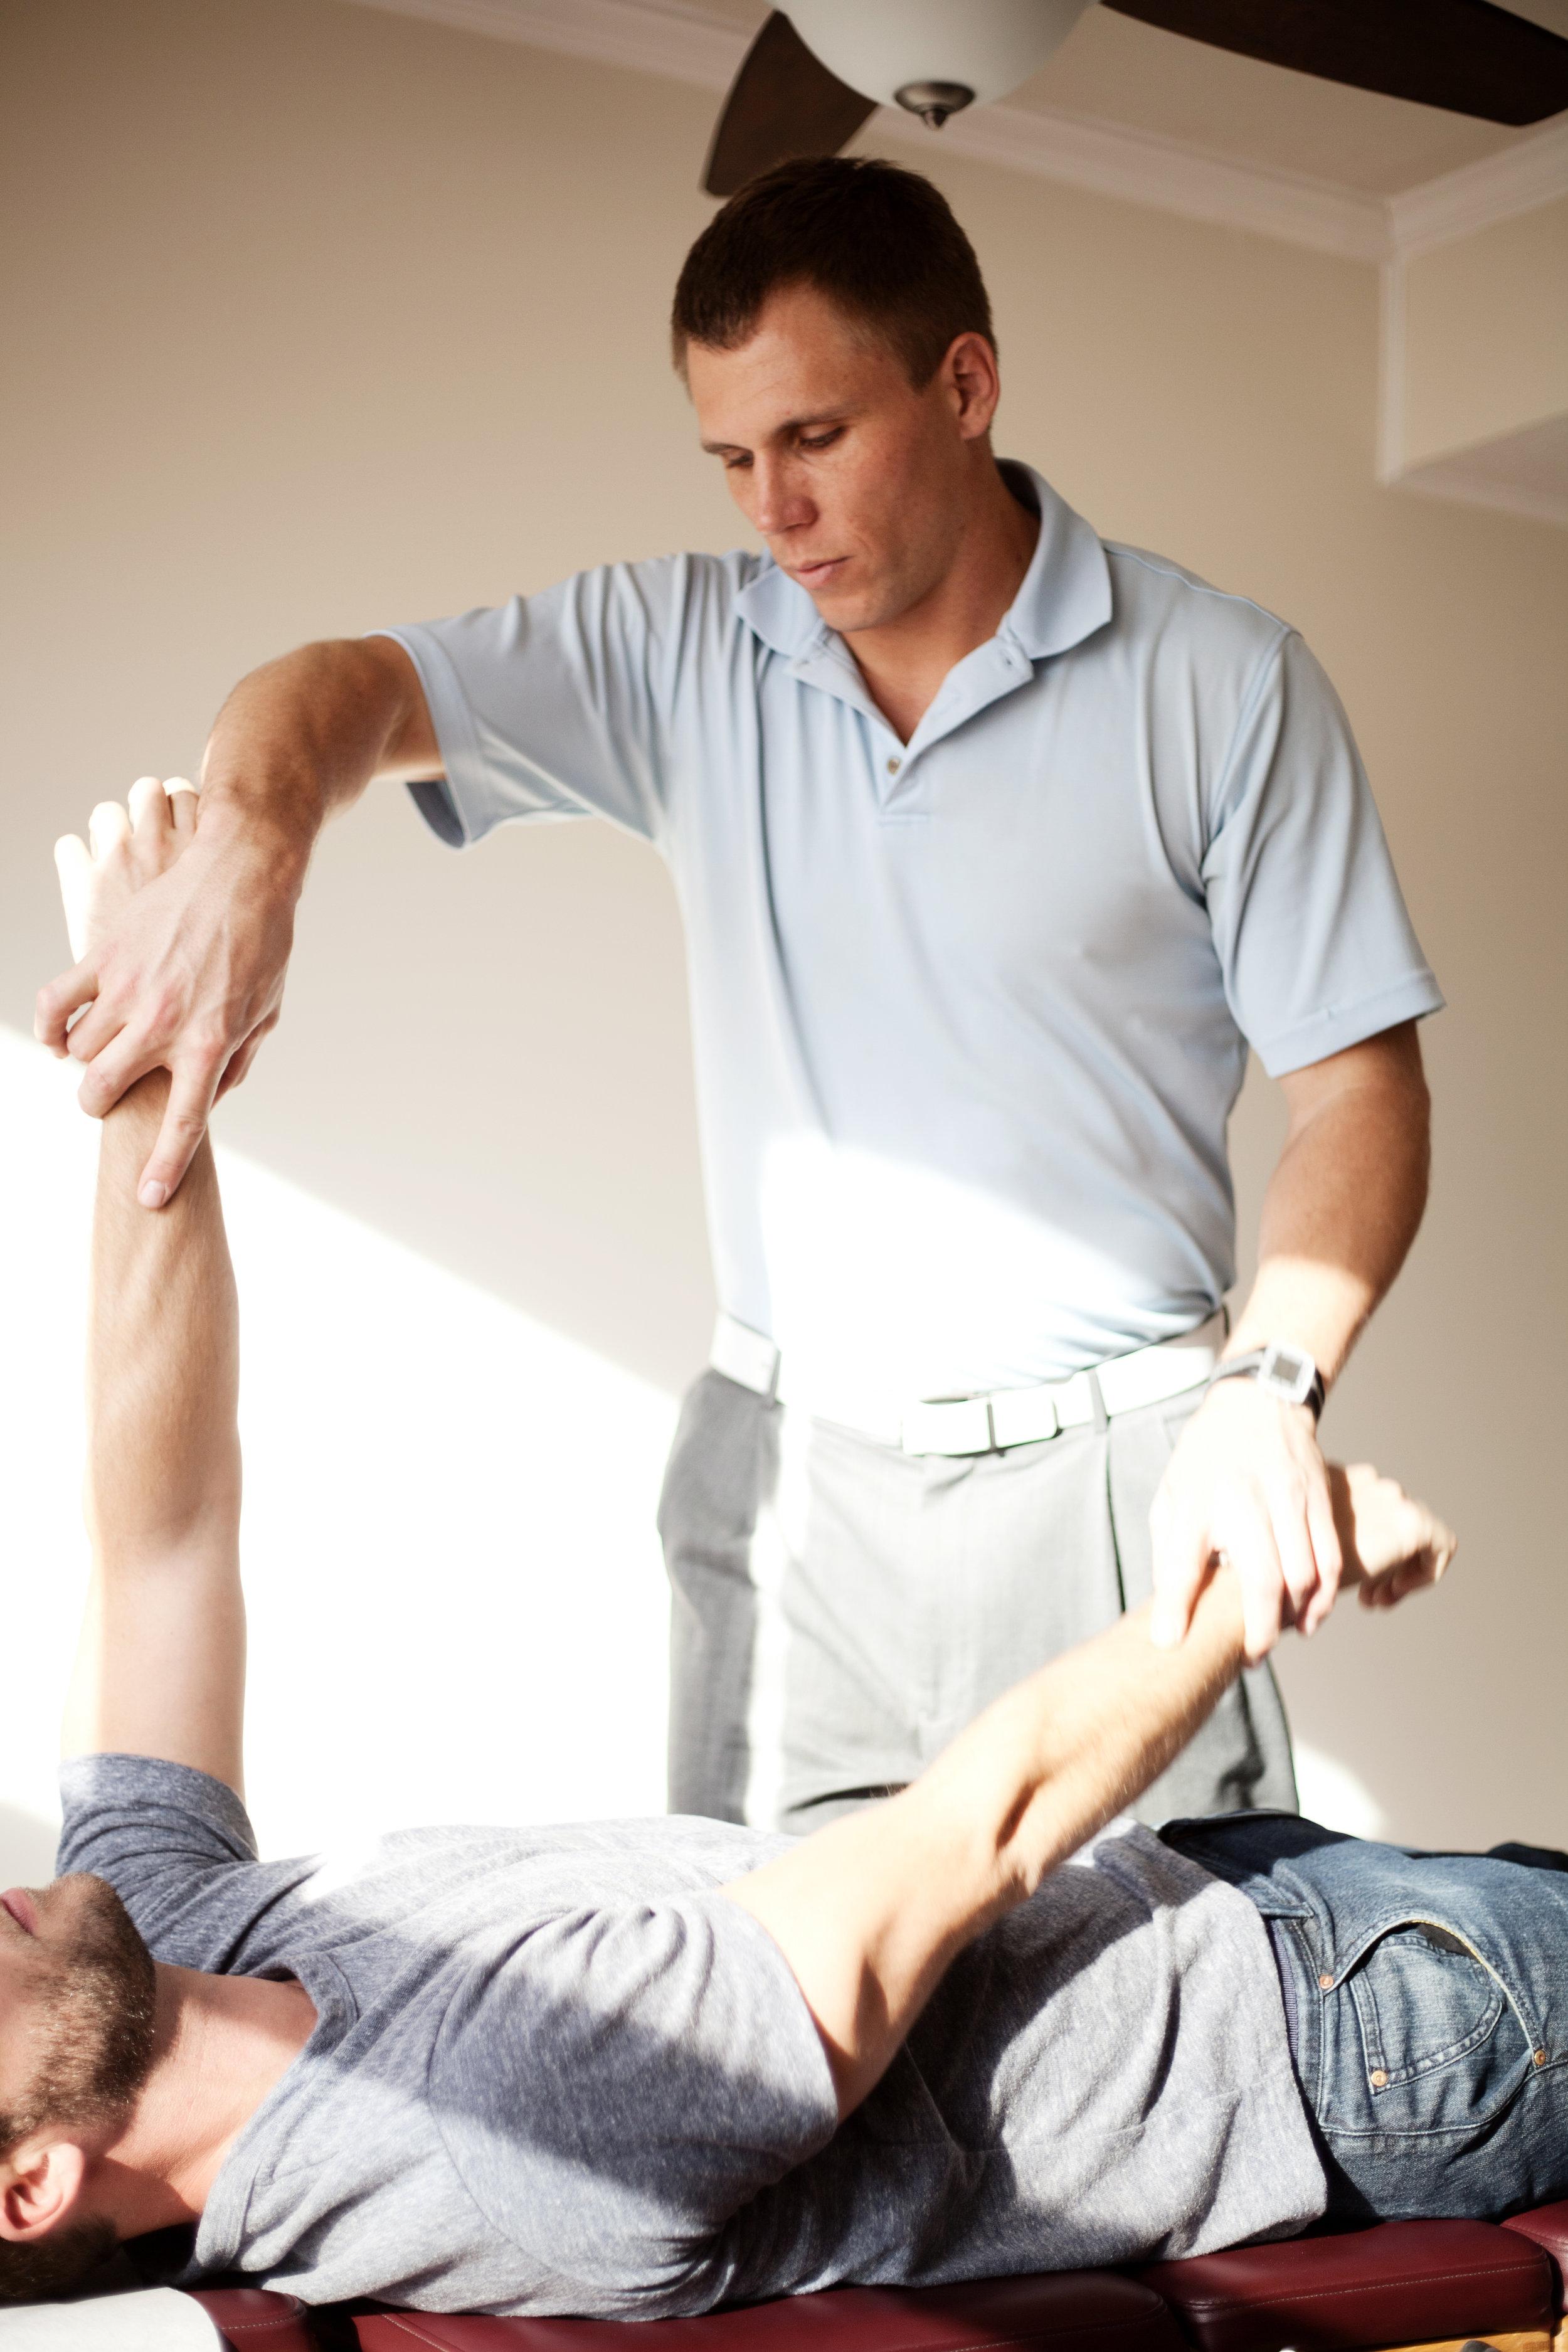 Dr.Mark-Aylor-Chiropractor-near-me.jpg